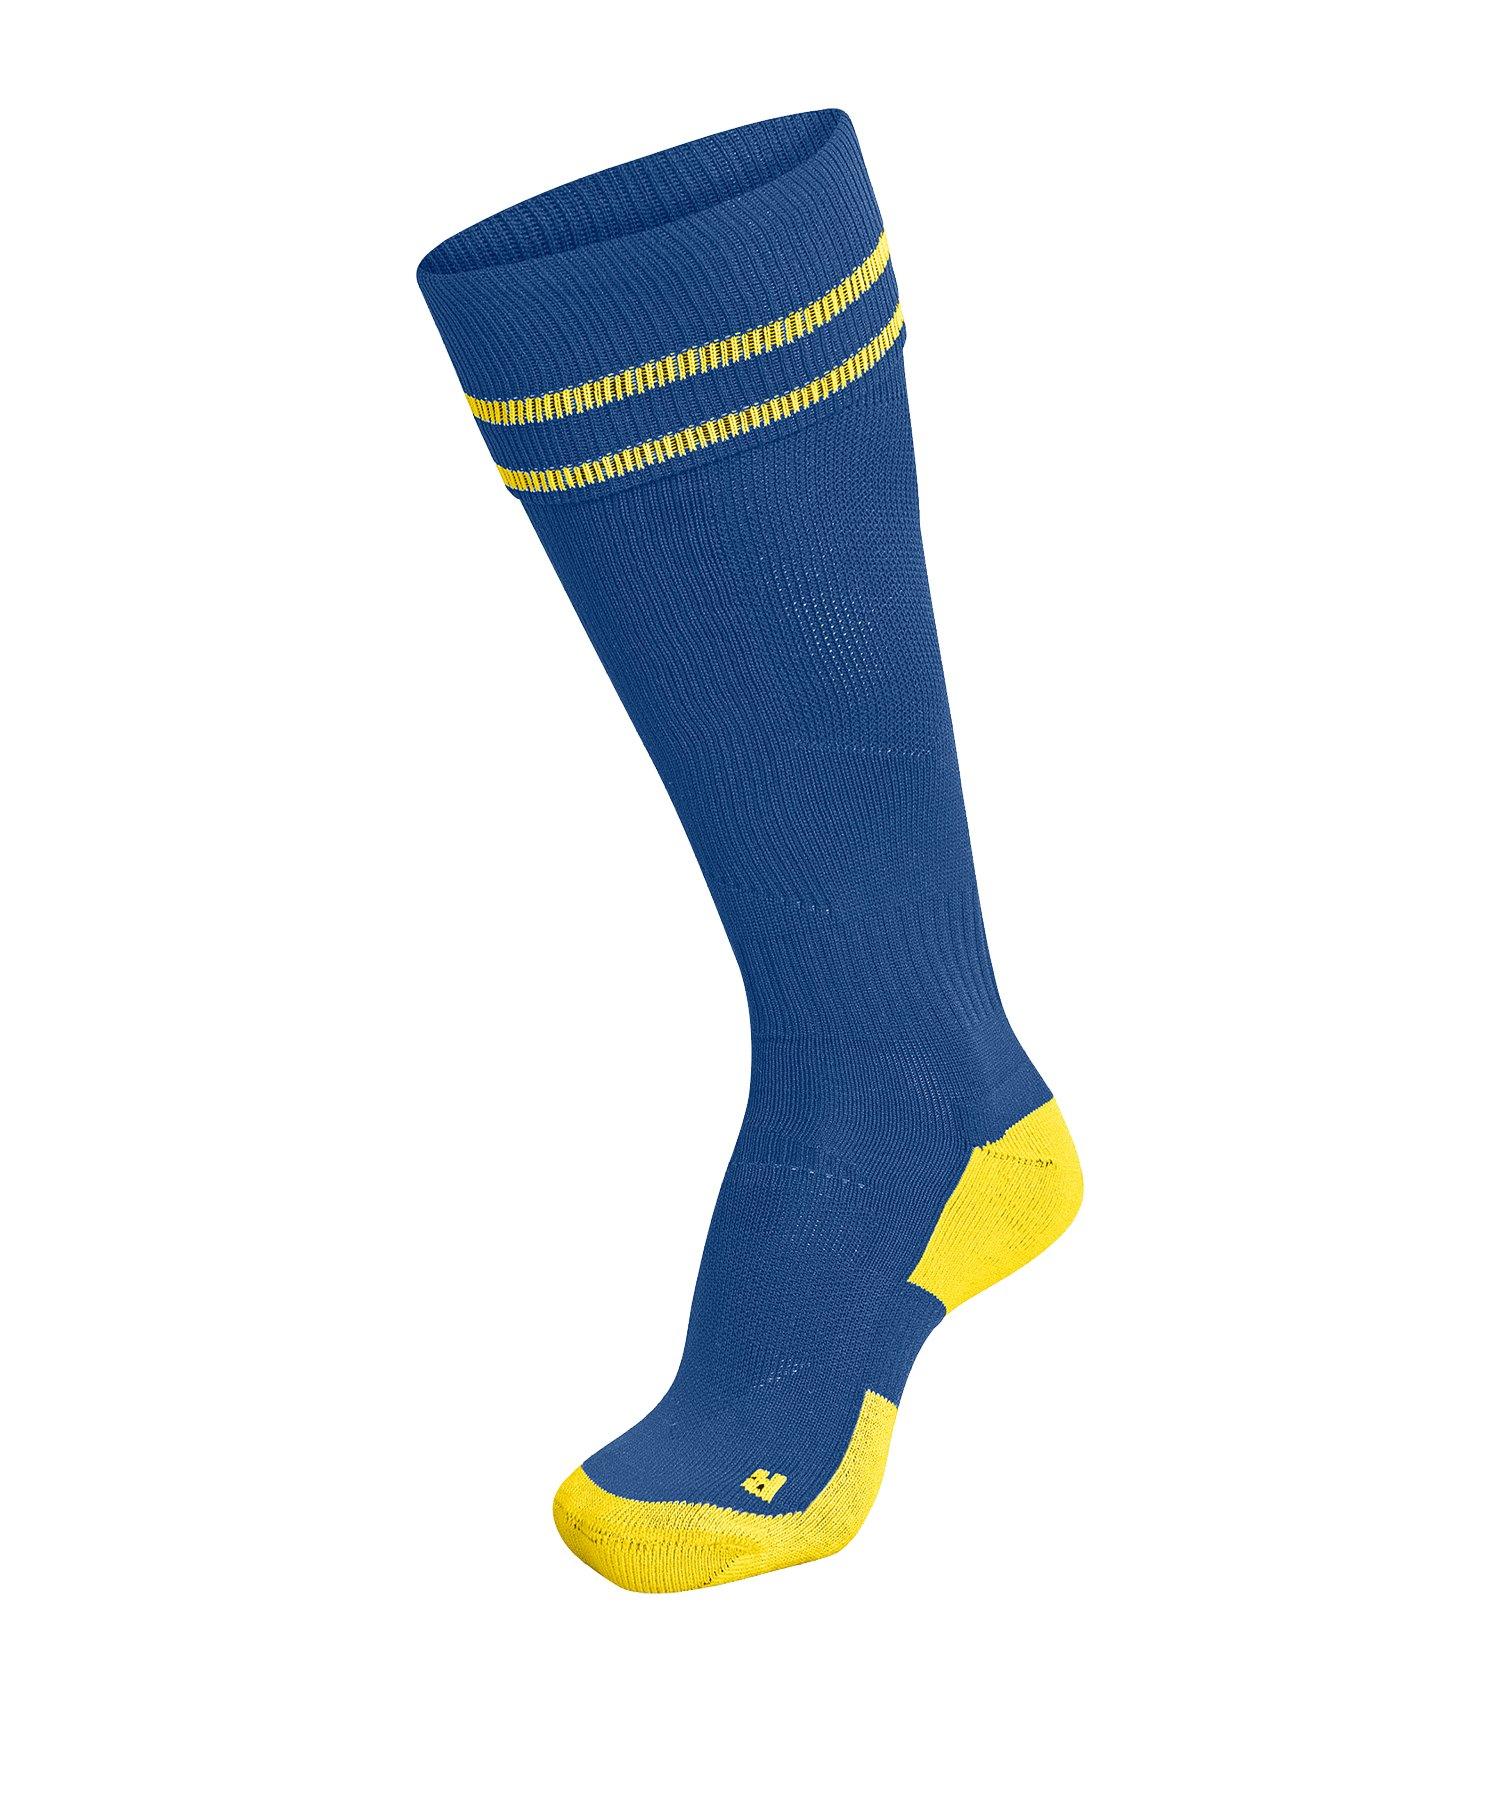 Hummel Football Sock Socken Blau F7724 - Blau